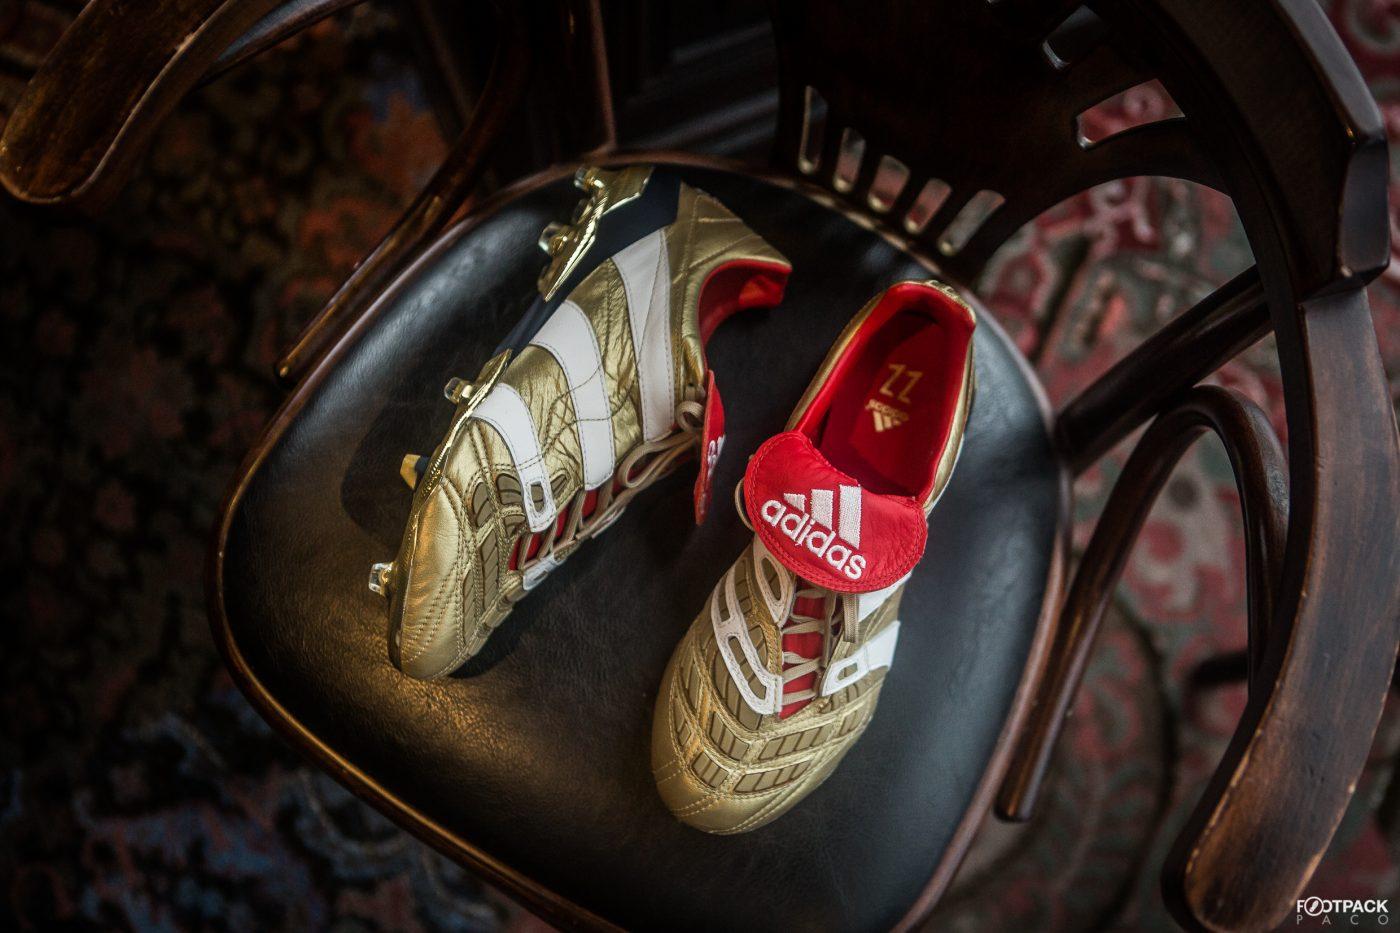 adidas-predator-accelerator-zinedine-zidane-collection-limitee-25-ans-predator-footpack-6